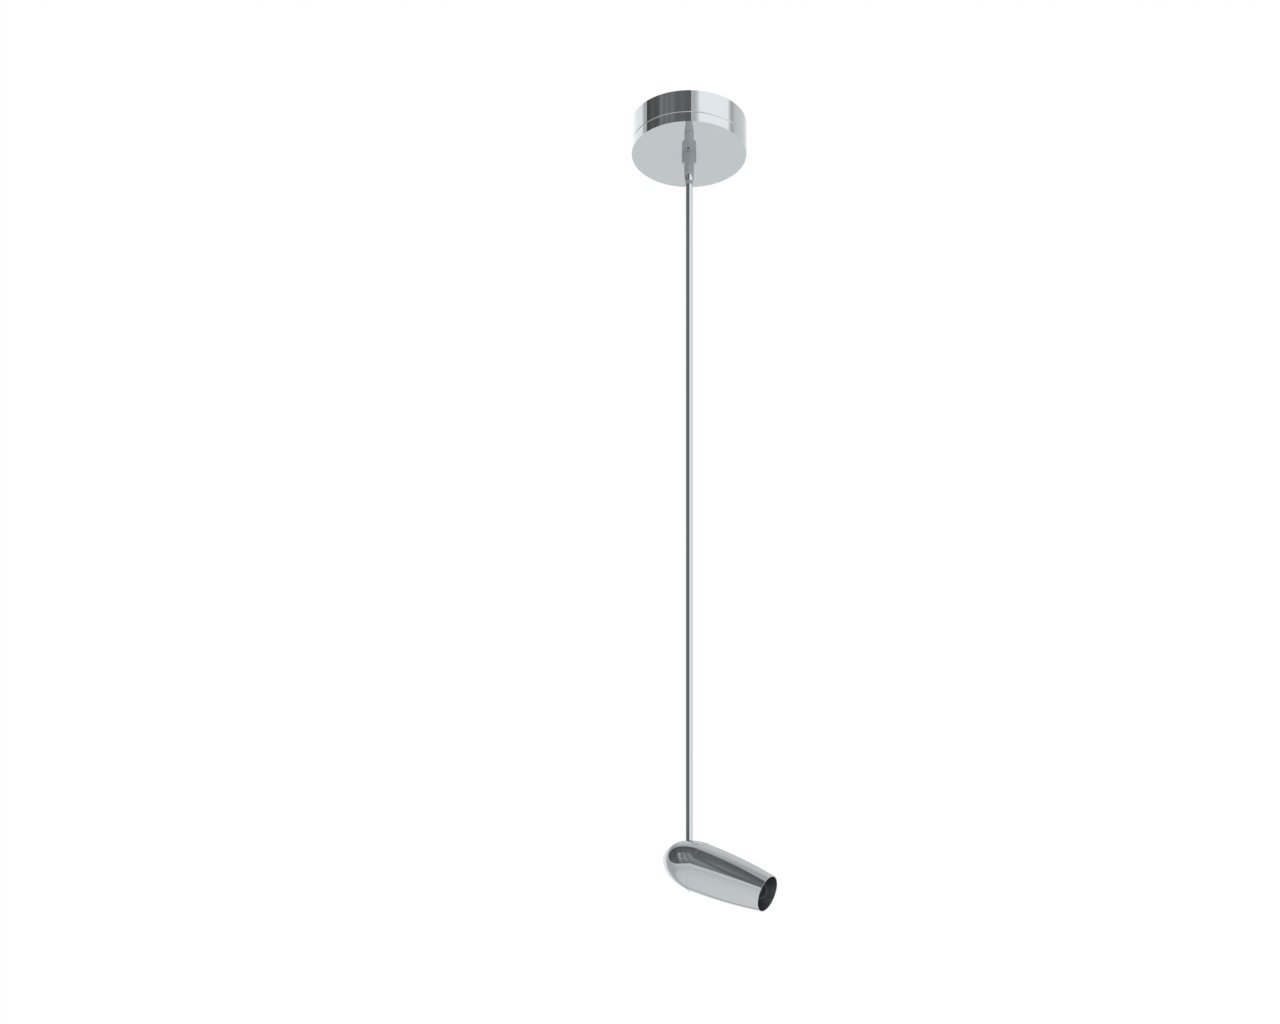 Prima Lighting 963-1601L-PC-36 Modern Howe Track Head, Small, Silver/Aluminum